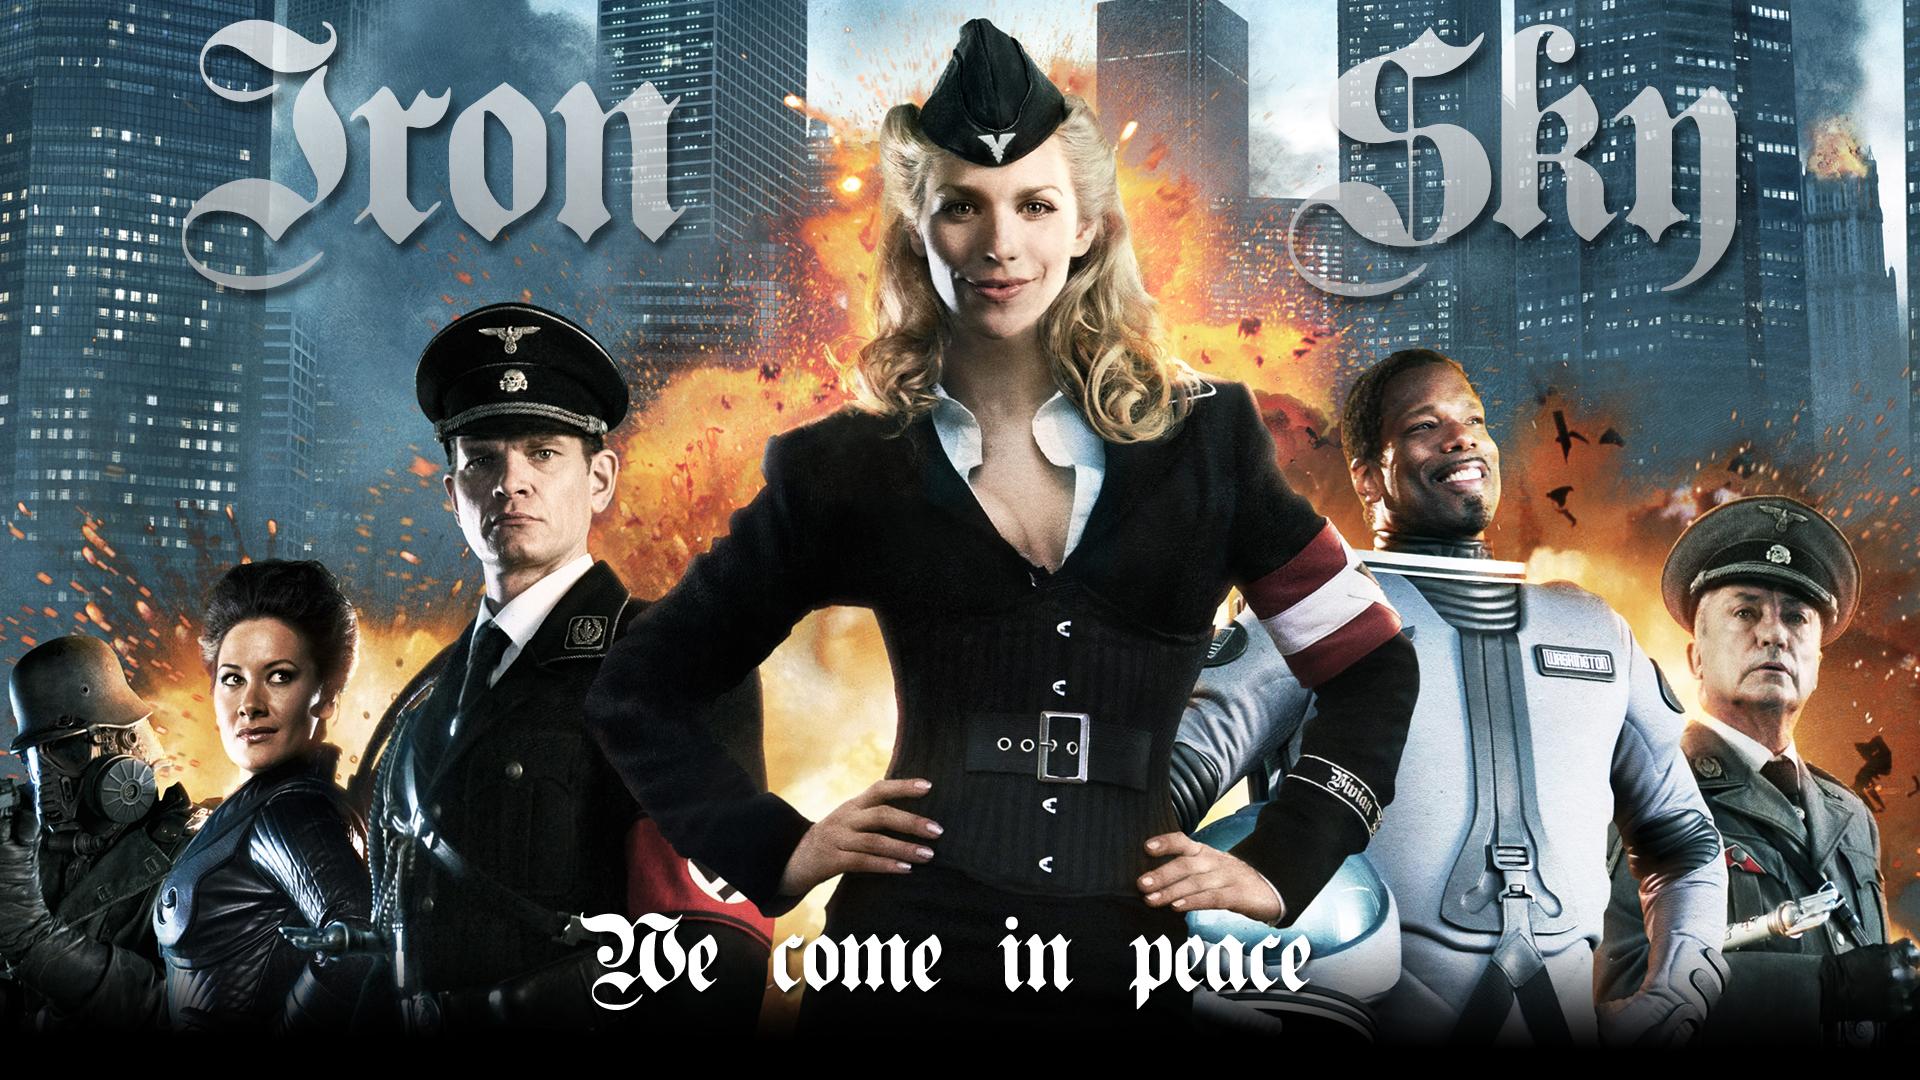 Image Result For Movie Trailer Download